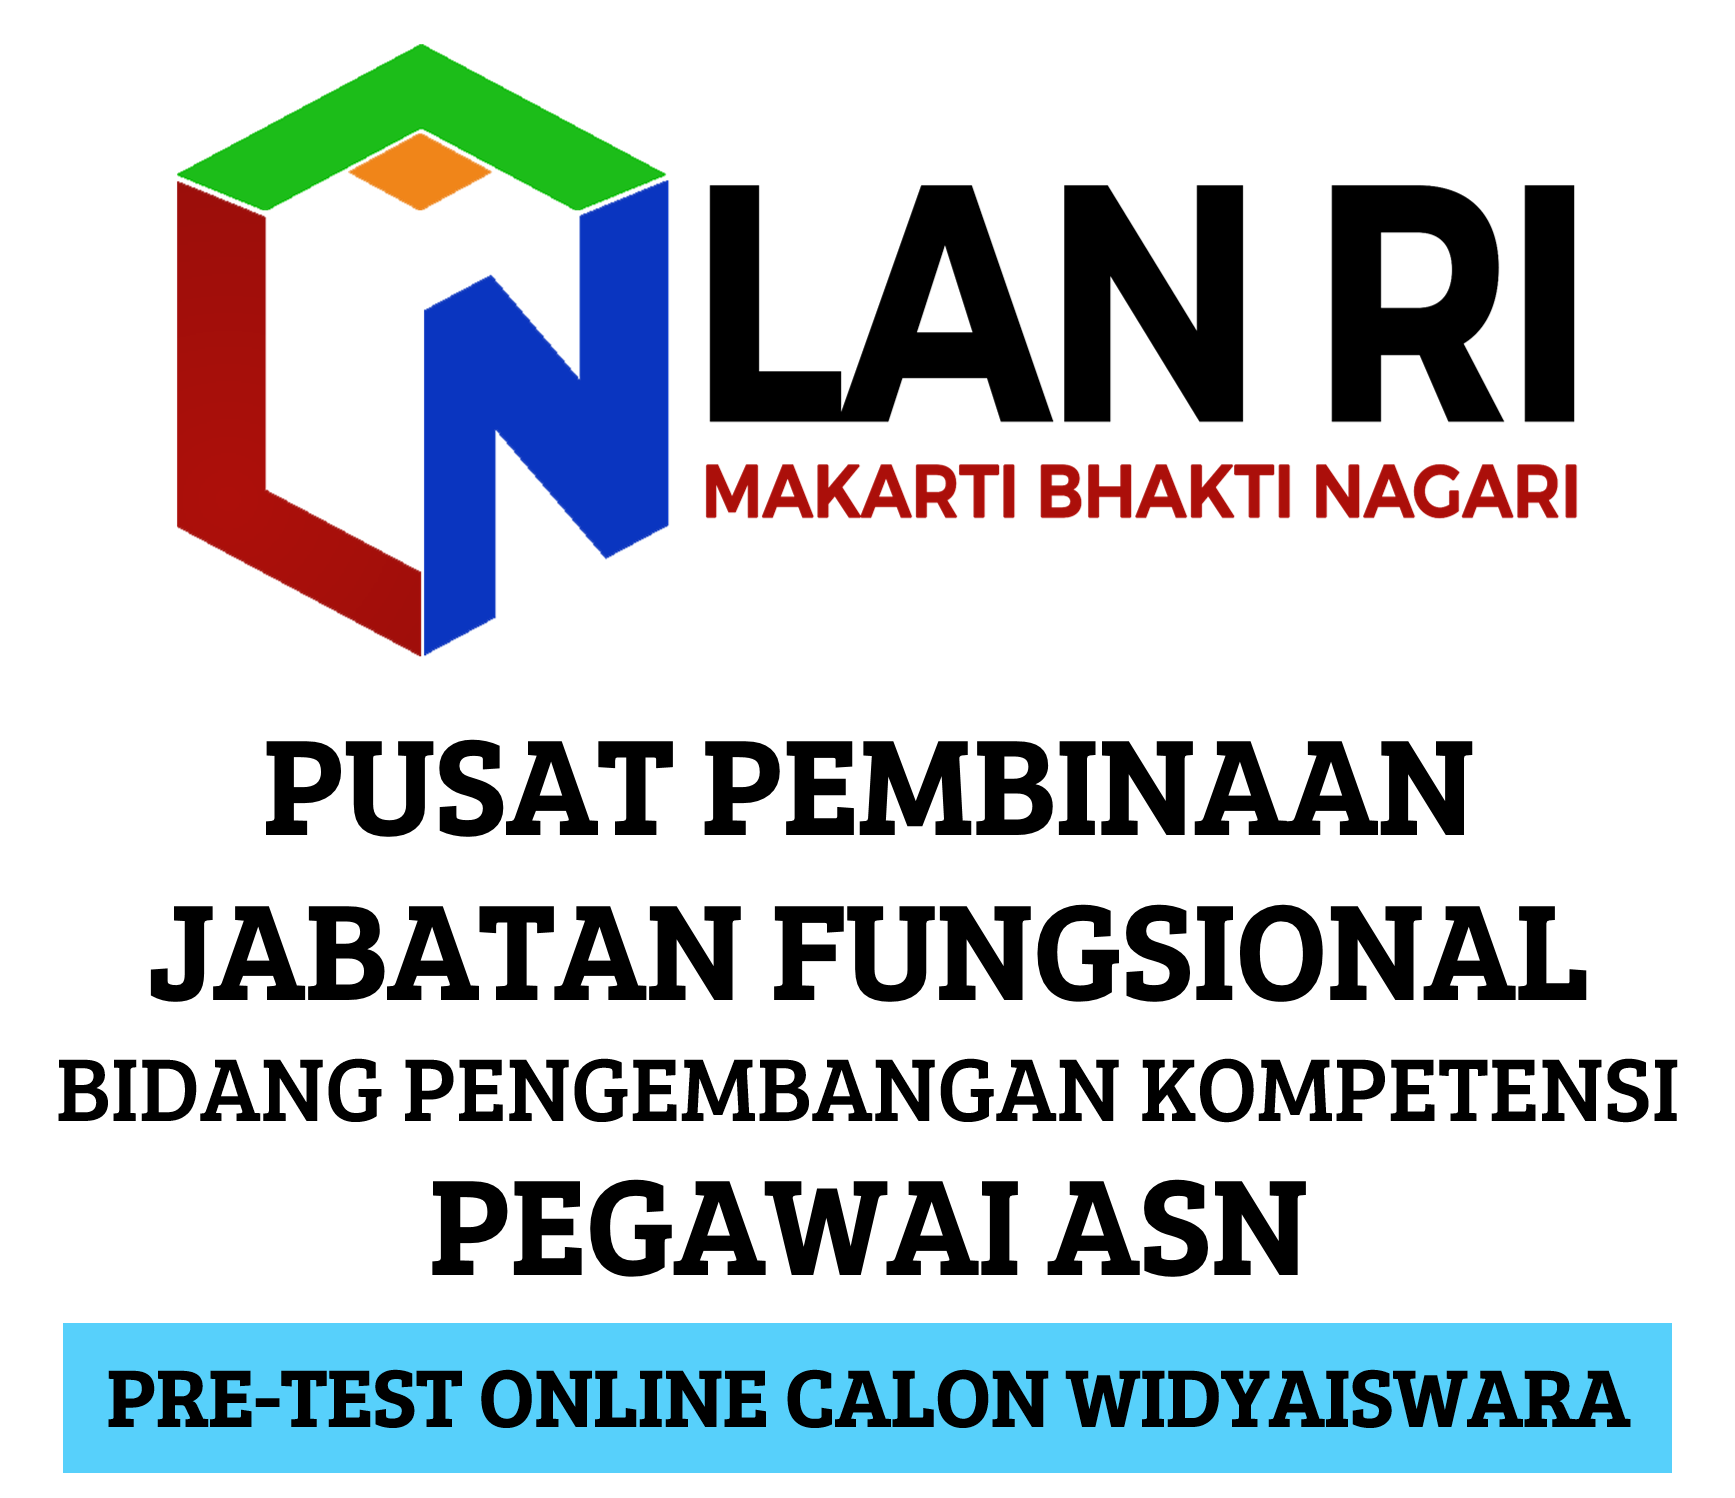 Pre-Test Calon Widyaiswara